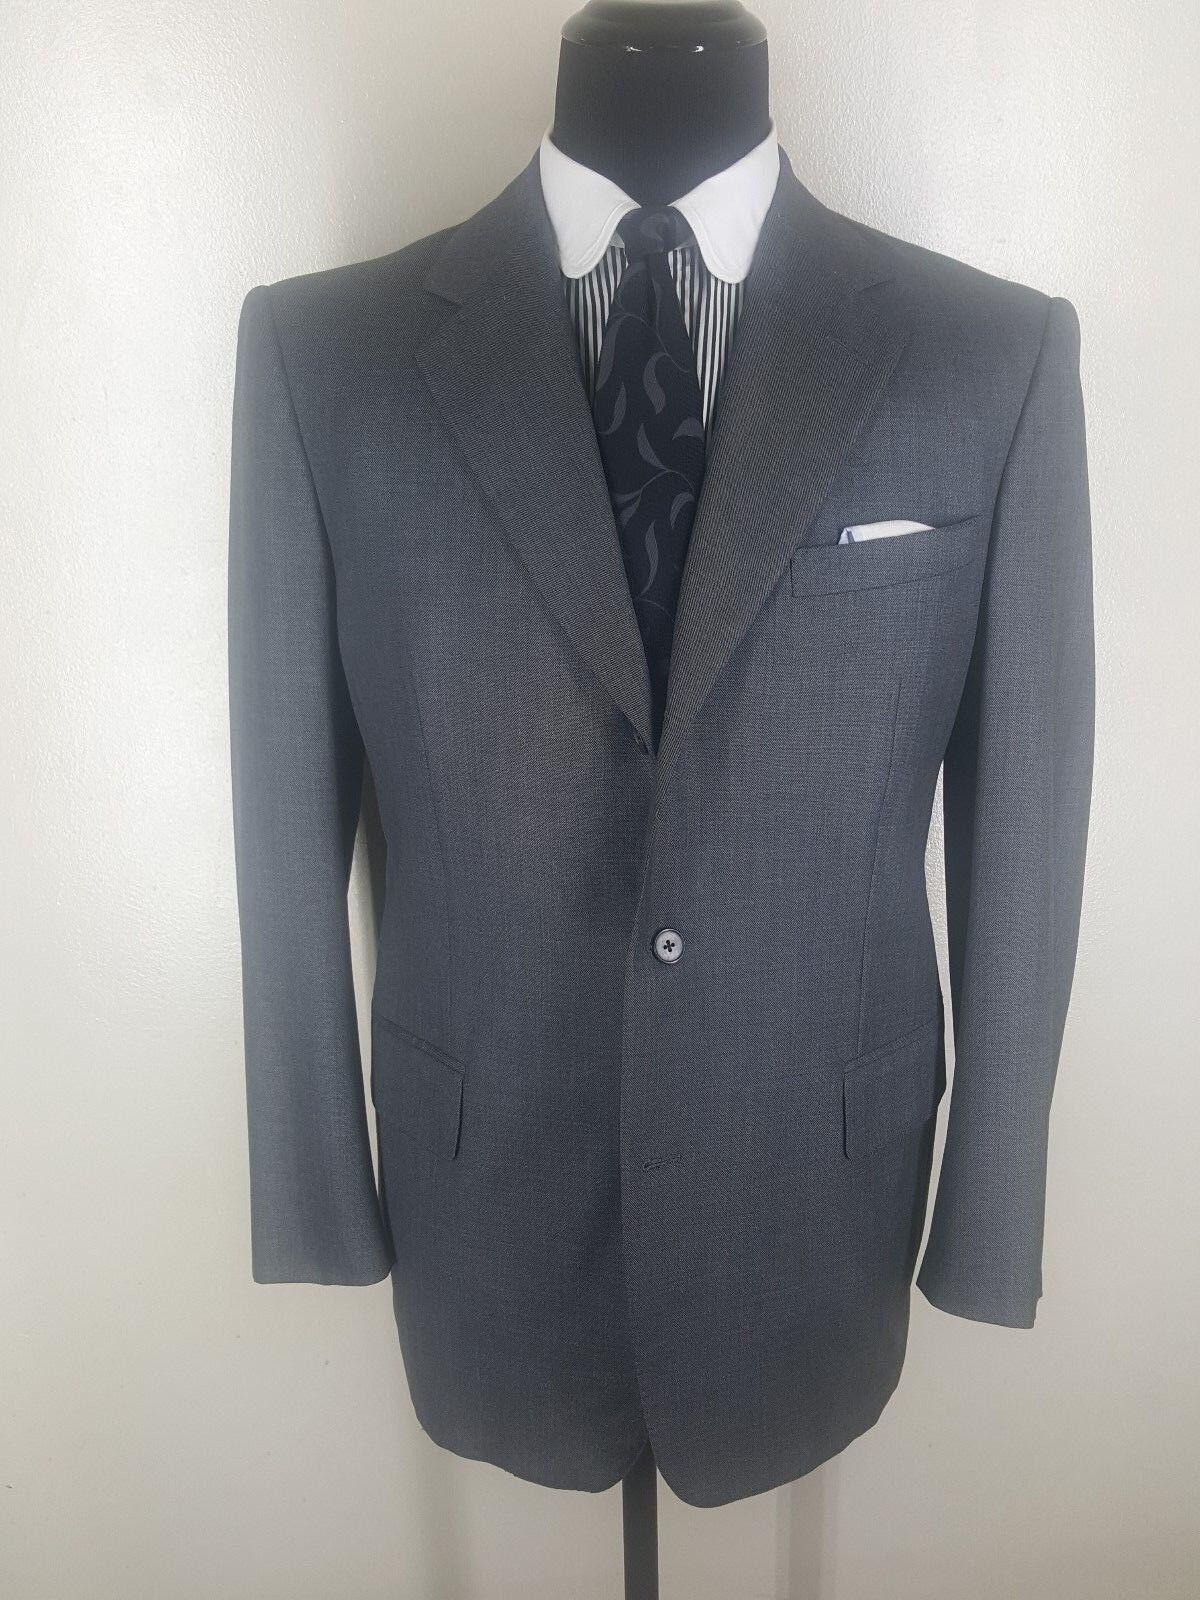 JOHN TUDOR Bespoke grau Suit 3 Btn. No Vents Made in U.S.A.  Fit  42-43 Reg